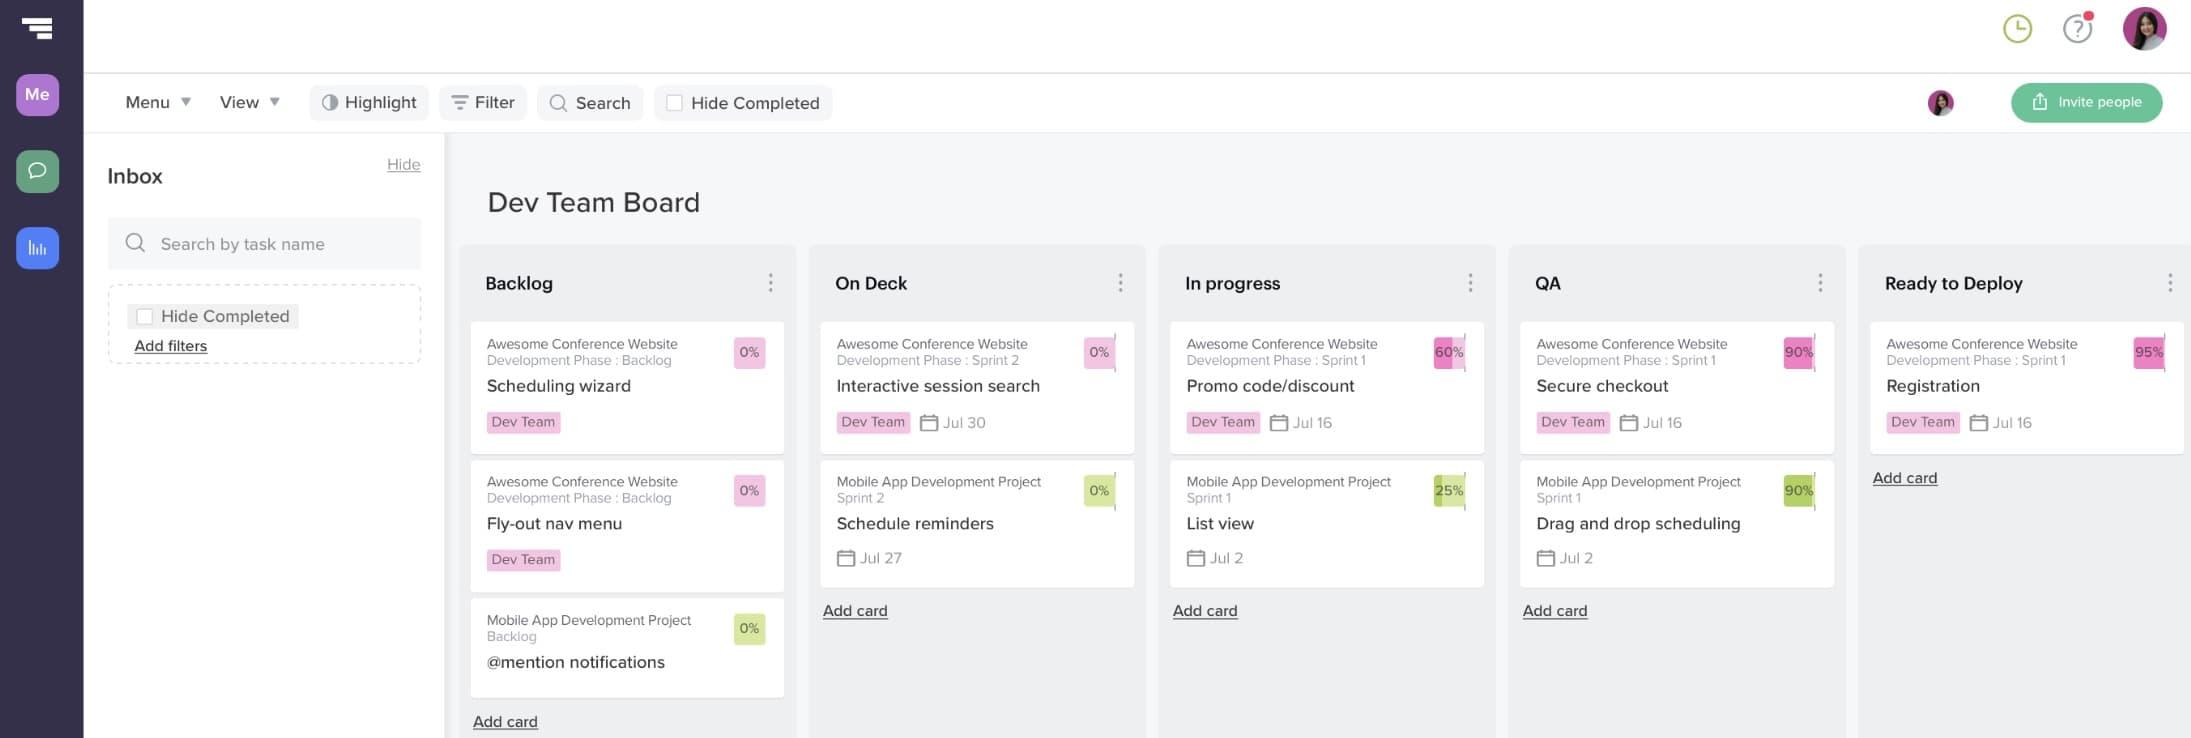 Custom kanban board in TeamGantt for managing Agile sprints in a hybrid project plan